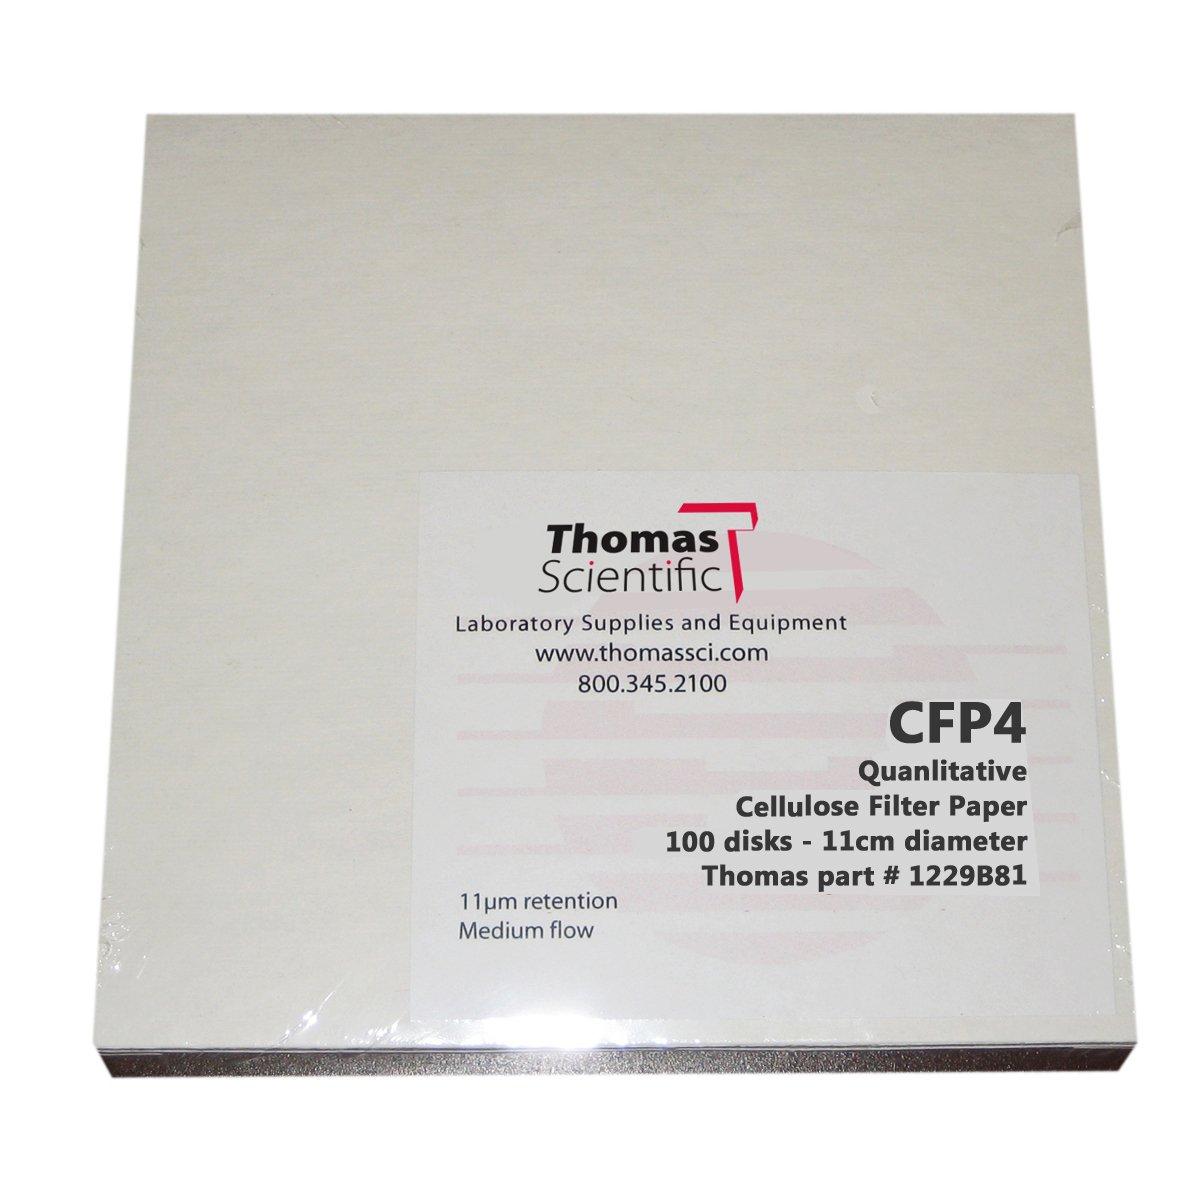 Grade 20-26 Micron Thomas CFP4-090 Cellulose Qualitative Filter Paper CFP4 Fast Flow Pack of 100 9cm Diameter